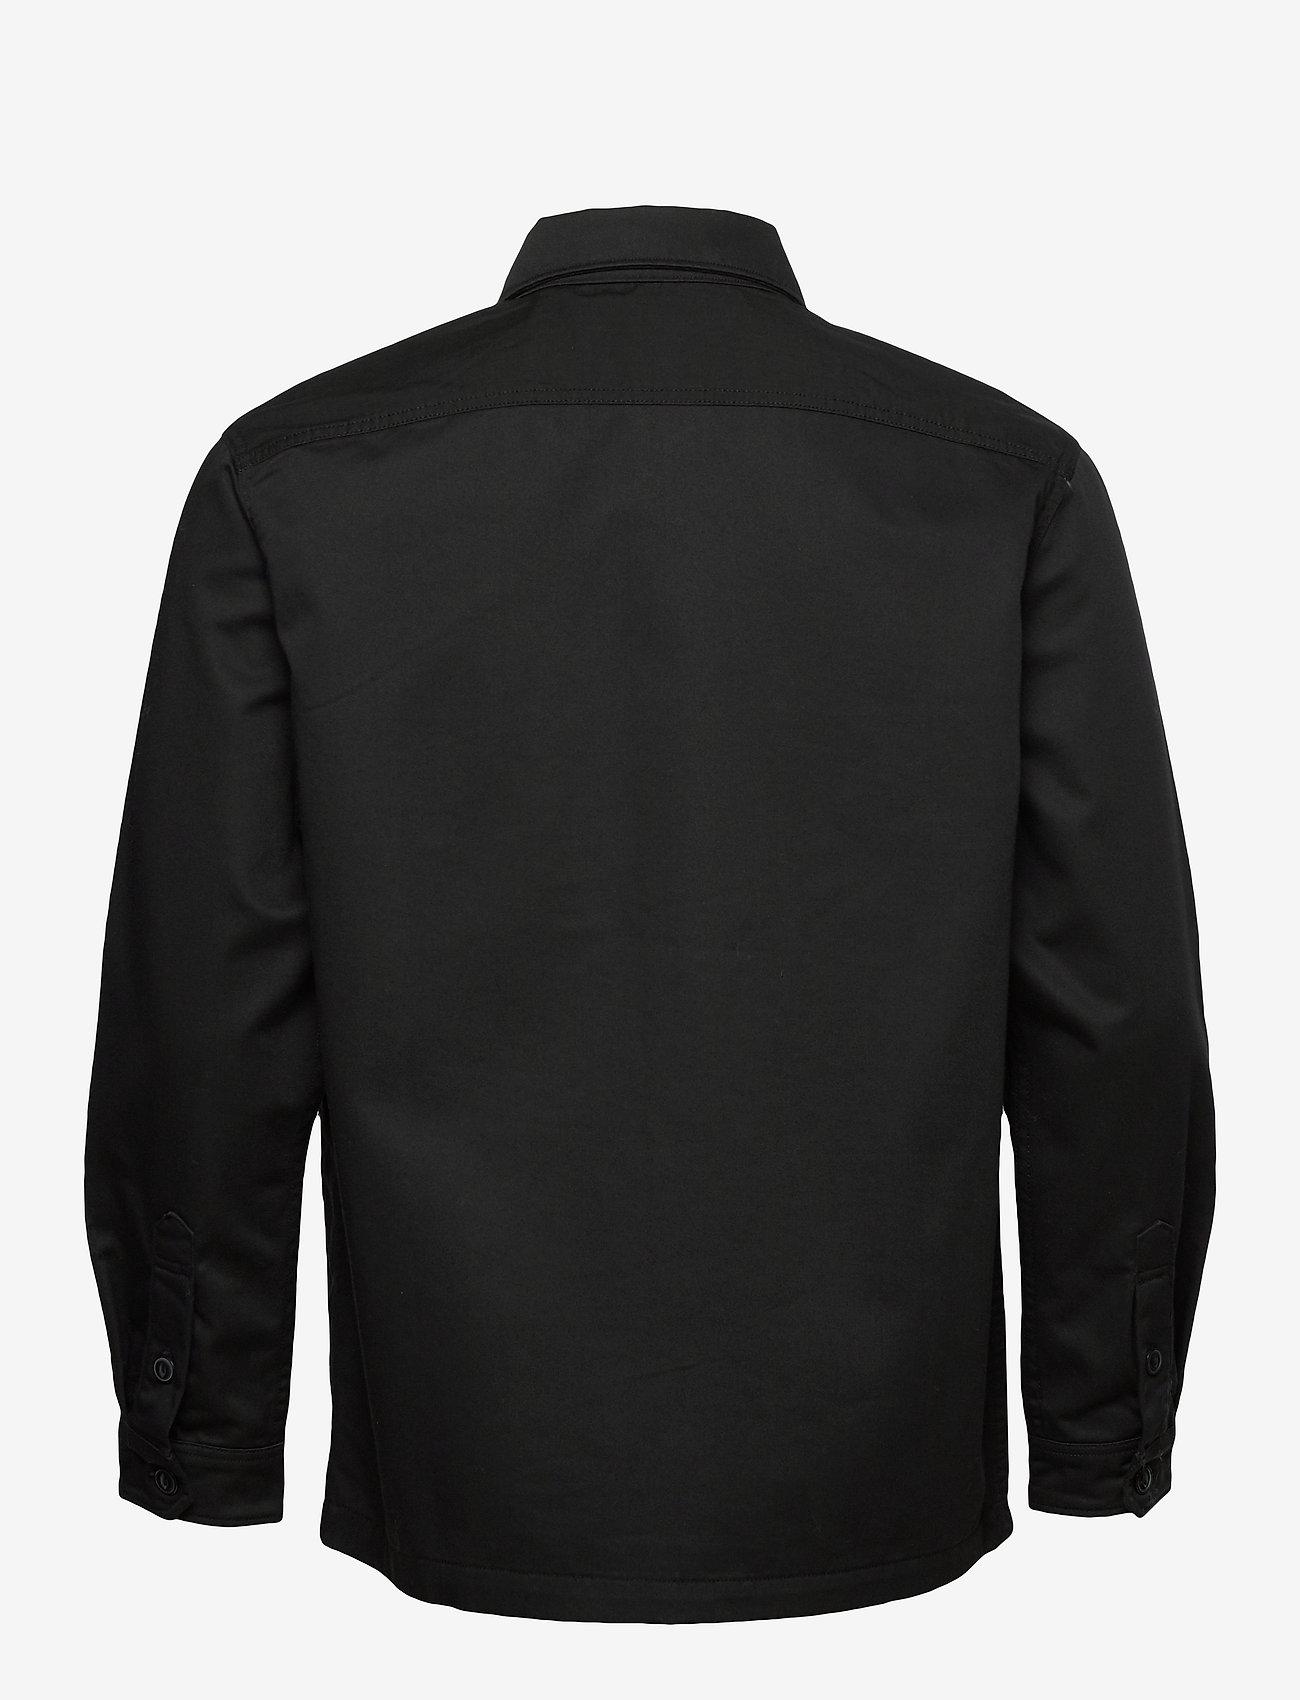 Lee Jeans - WORKWEAR OVERSHIRT - tops - black - 1